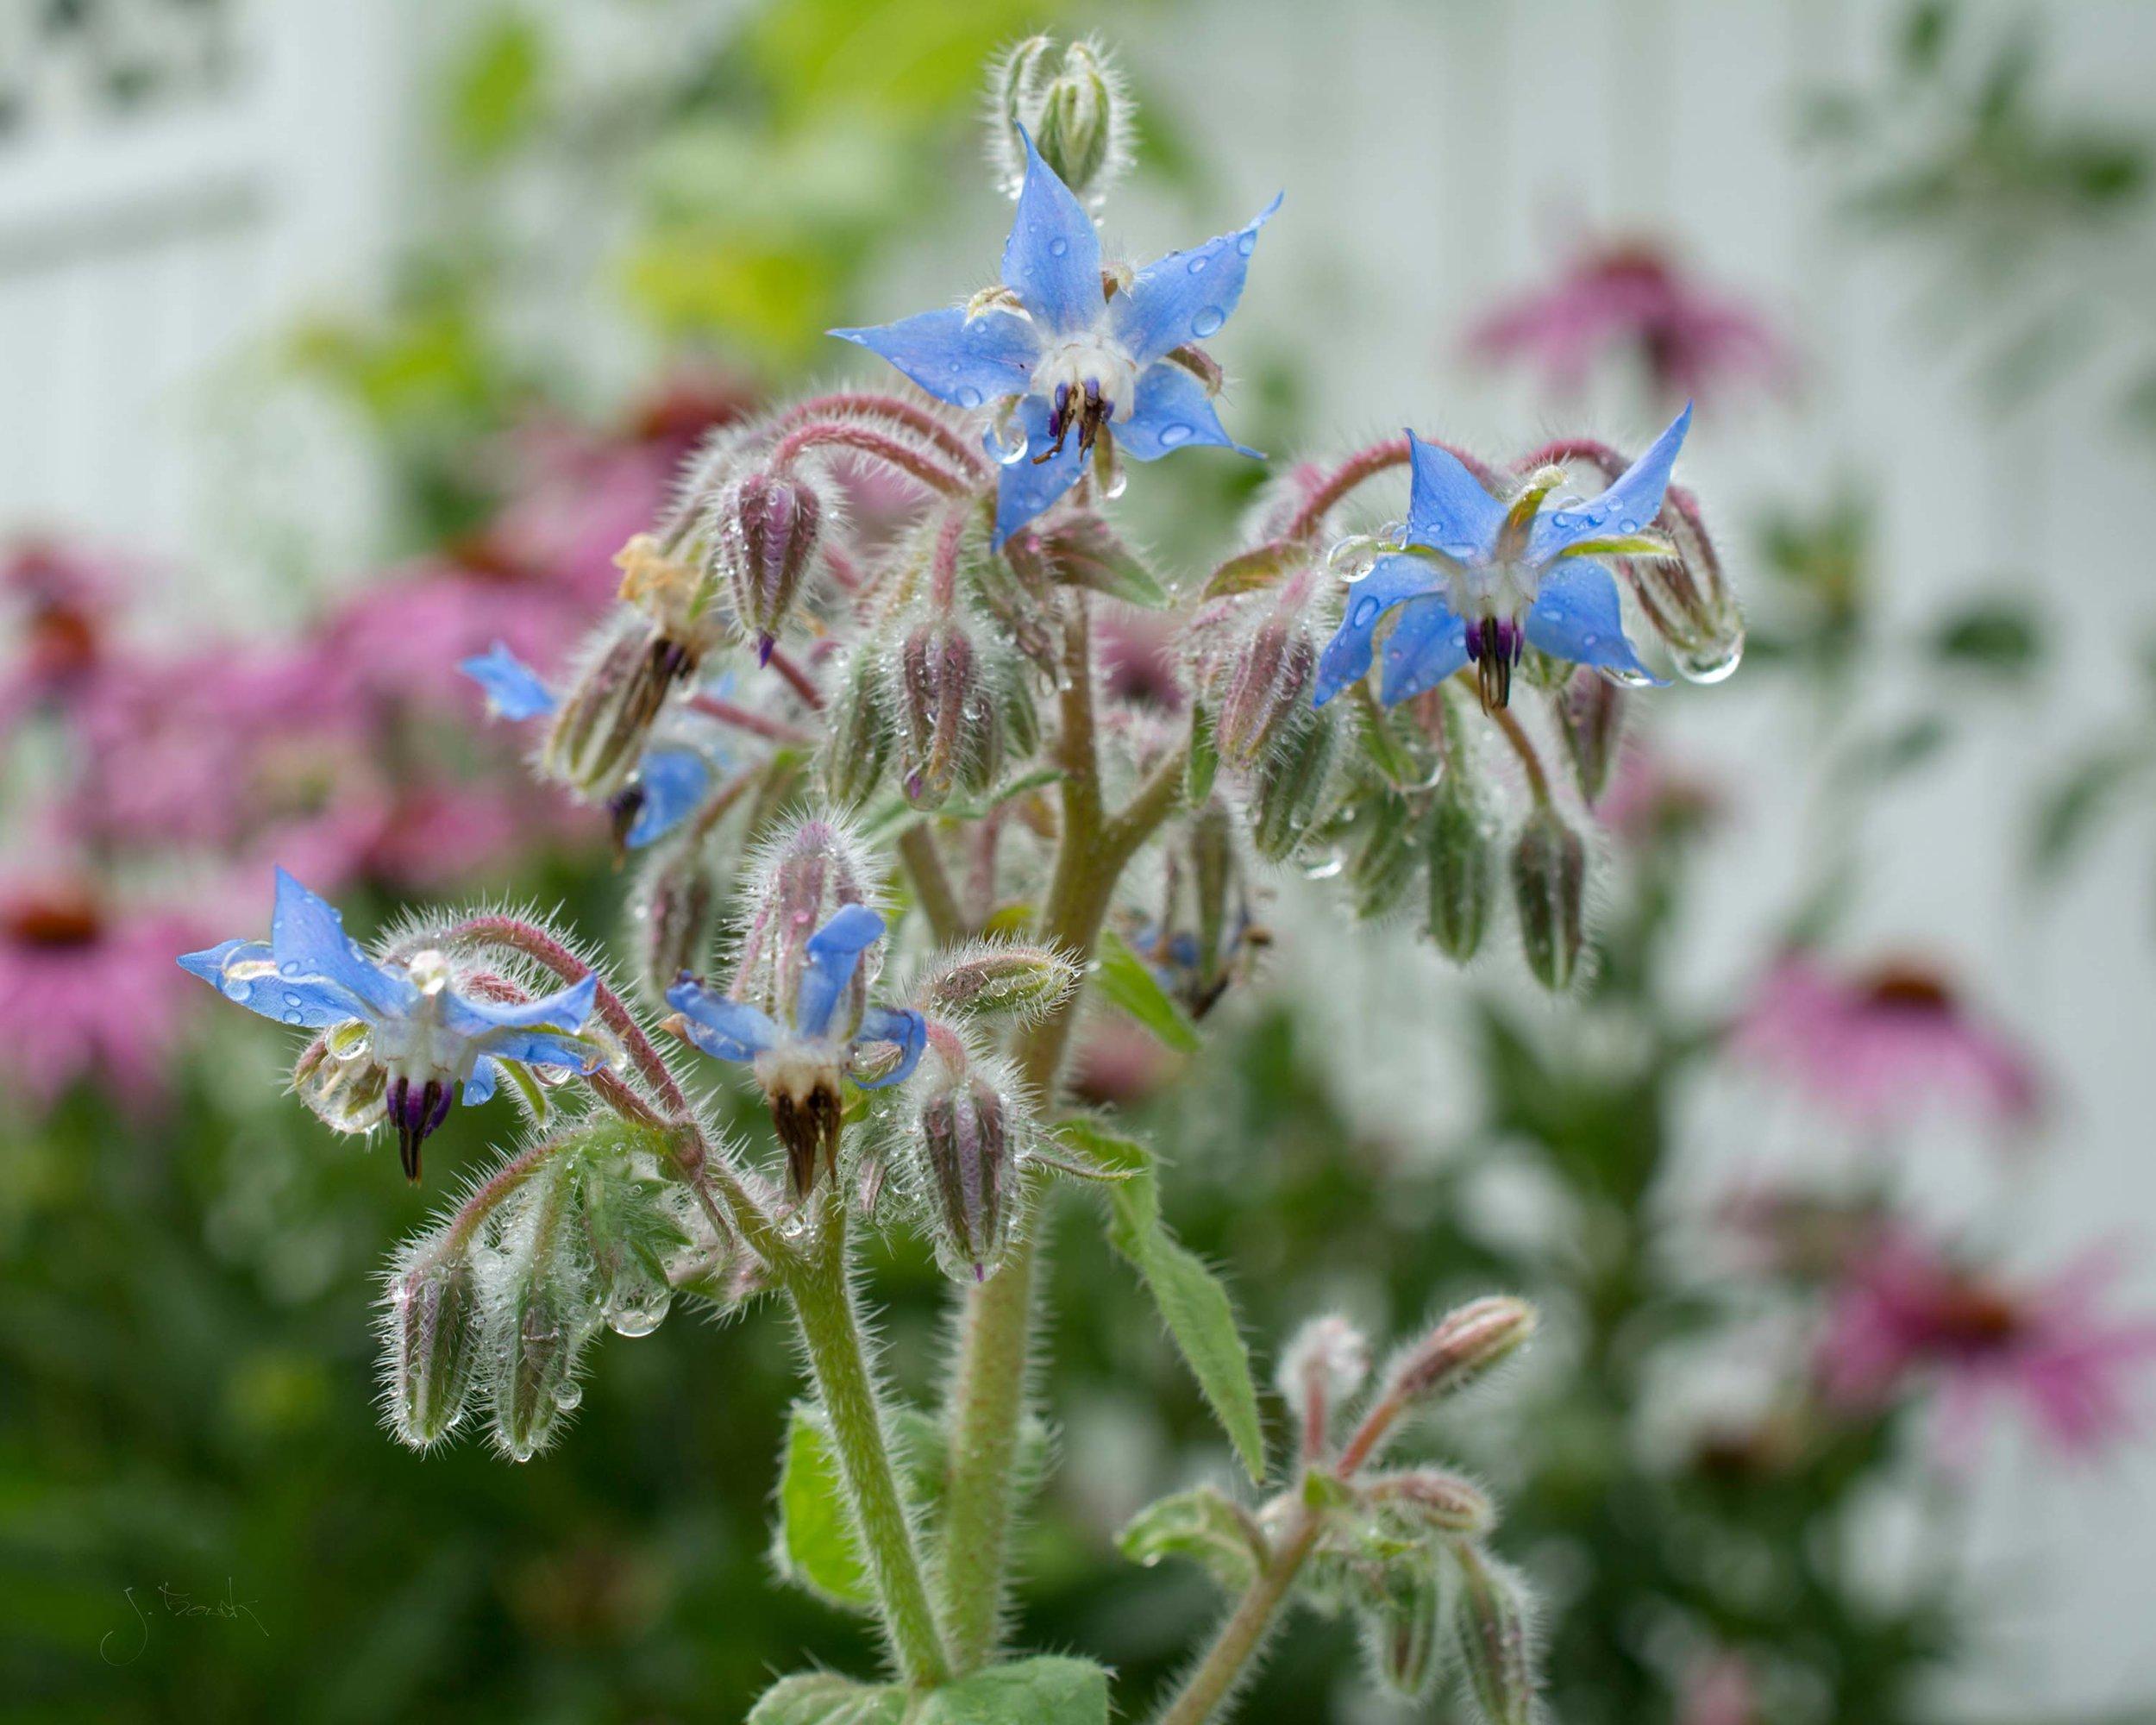 Dew on Blue Petals 8180 10x8 Floater Frame Gallery Wrap.jpg